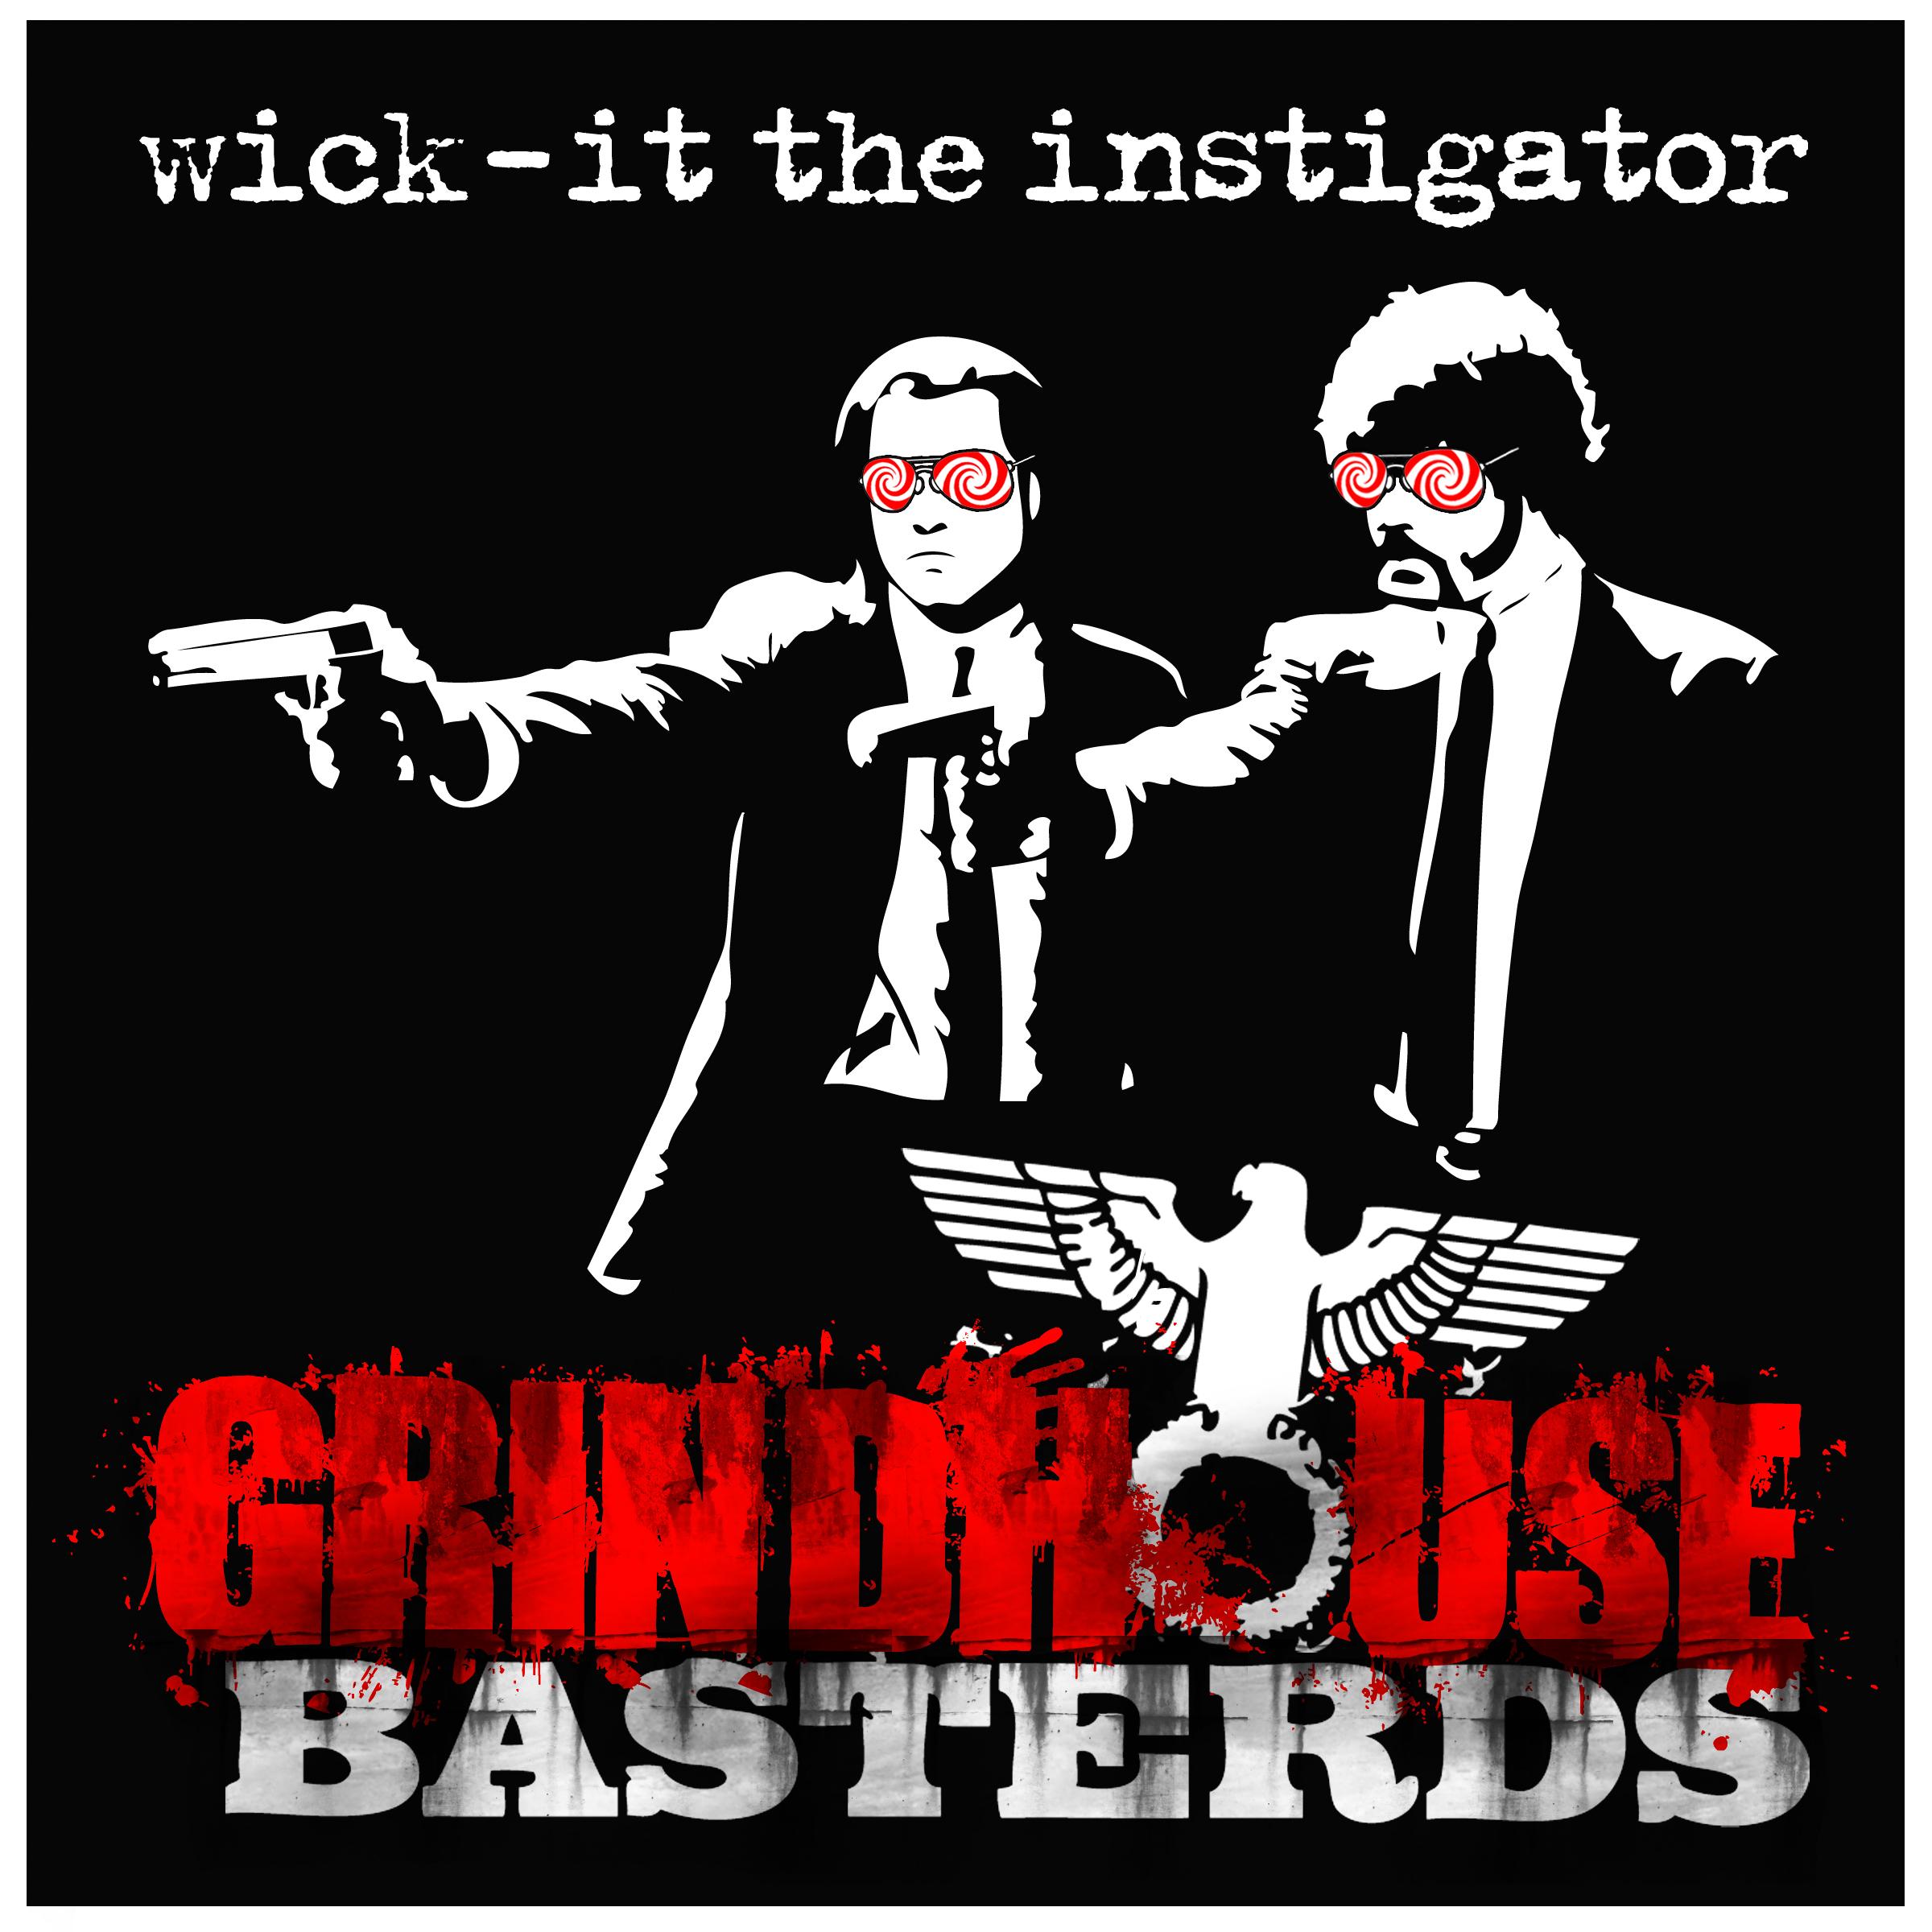 Reservoir Dawgz – feat. Bun B and Yelawolf – By Wick-it the Instigator